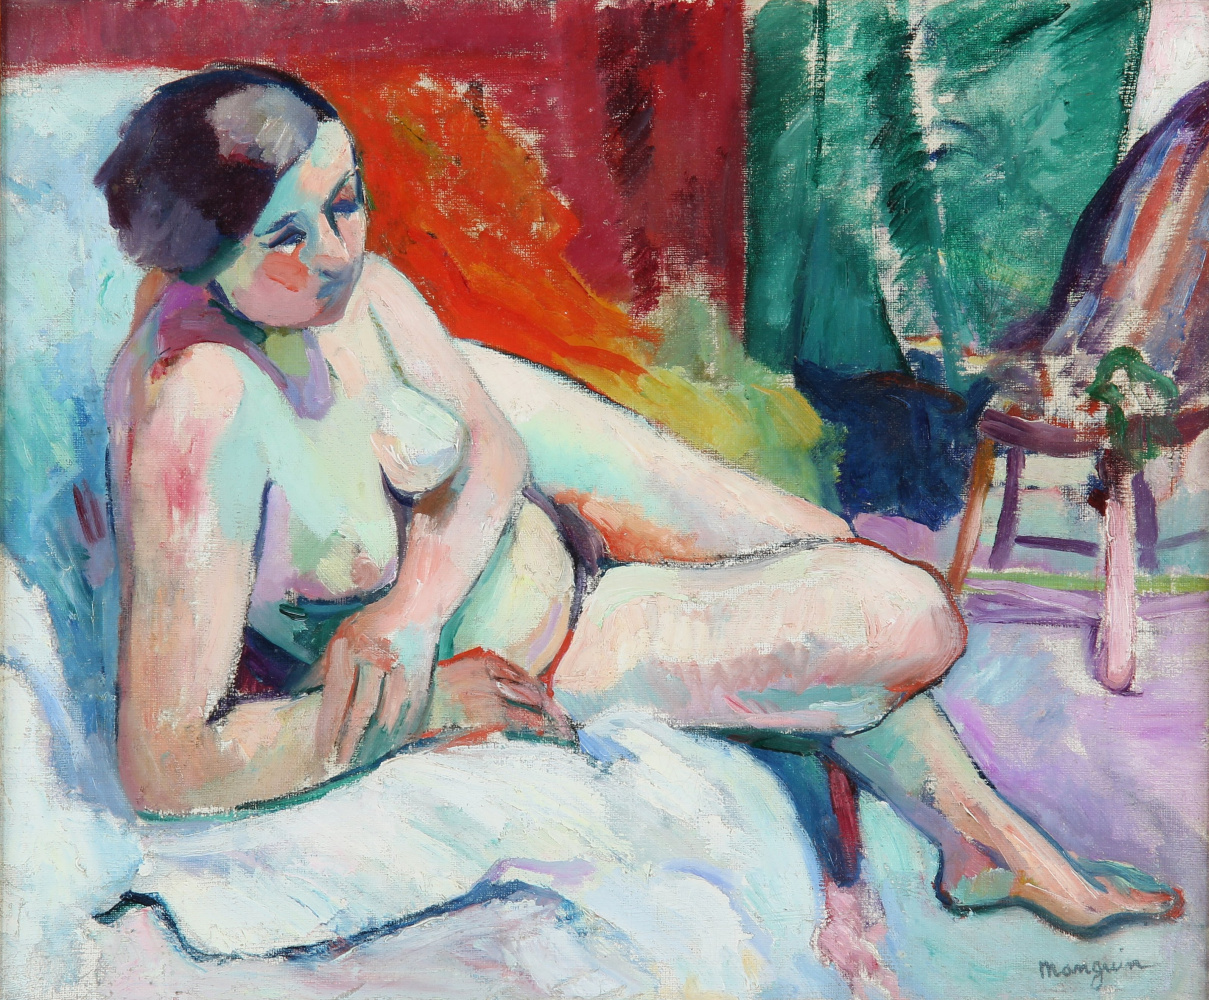 Henri Manguin. Reclining Nude in Studio